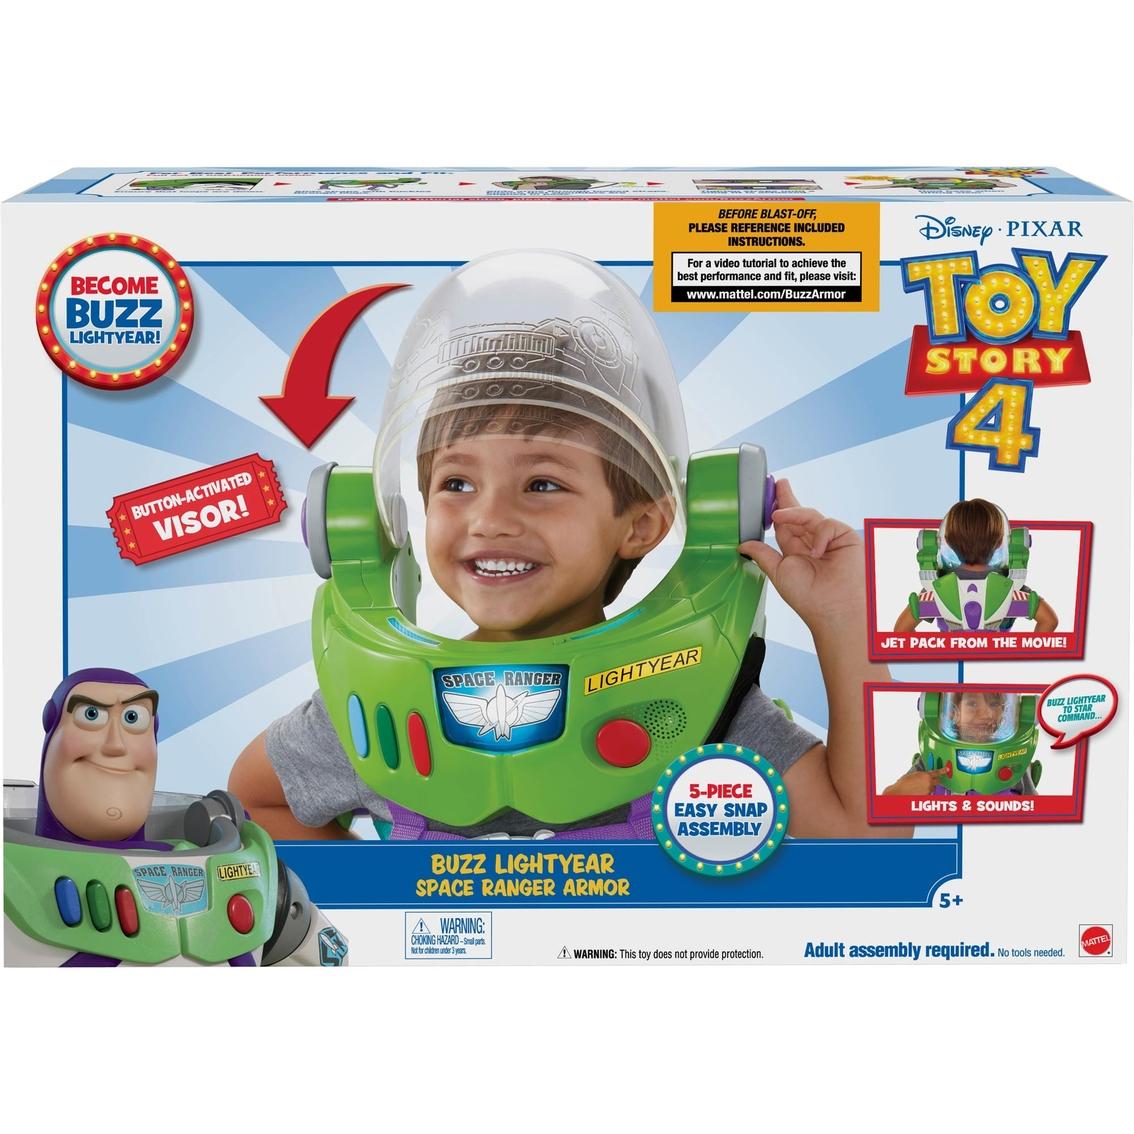 Toy Story 4 Buzz Lightyear Space Ranger Armor Helmet Jet Pack Toy Disney Pixar